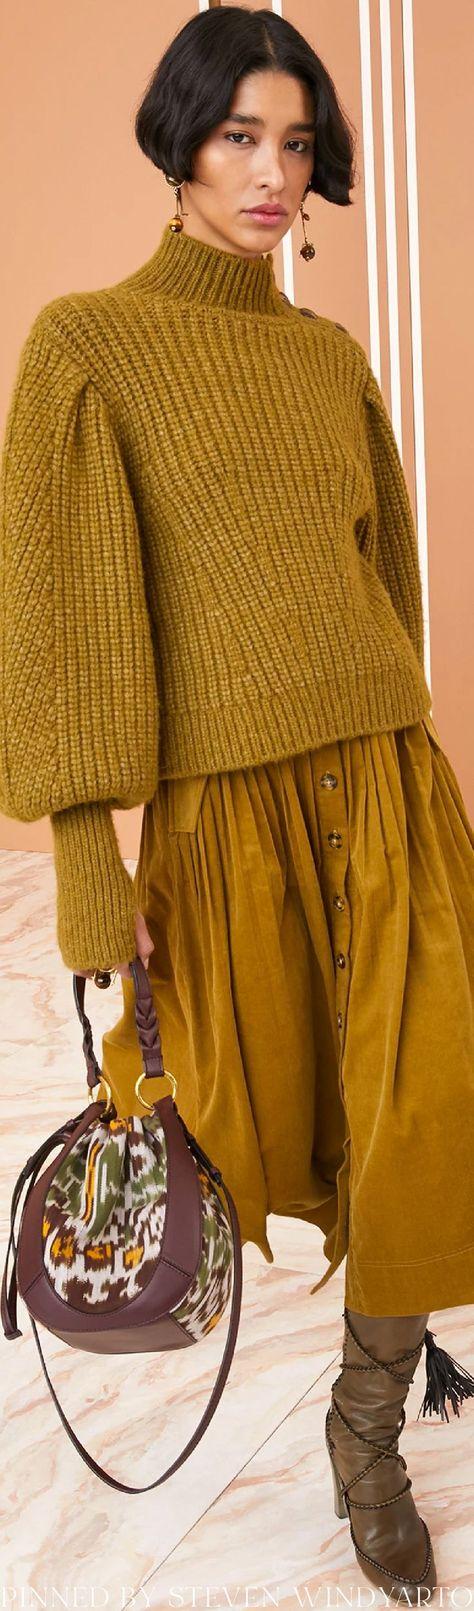 Ulla Johnson Fall 2021 Lookbook - Alana Pullover #fall2021 #fw21 #womenswear #ullajohnson